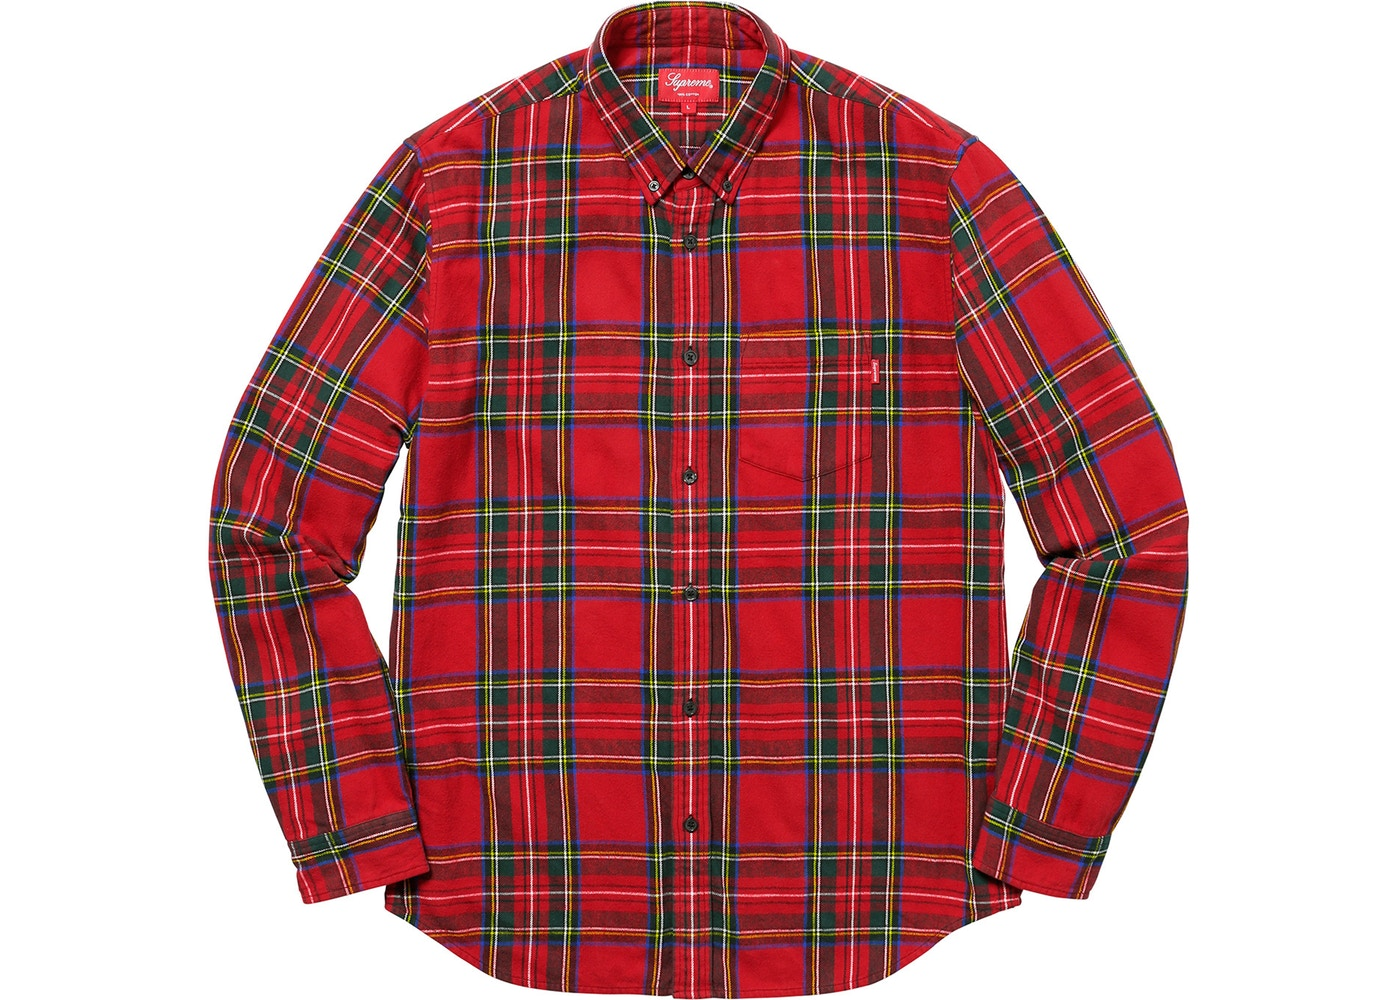 e85d32cb036 Supreme Supreme Tartan Flannel Shirt Red Large